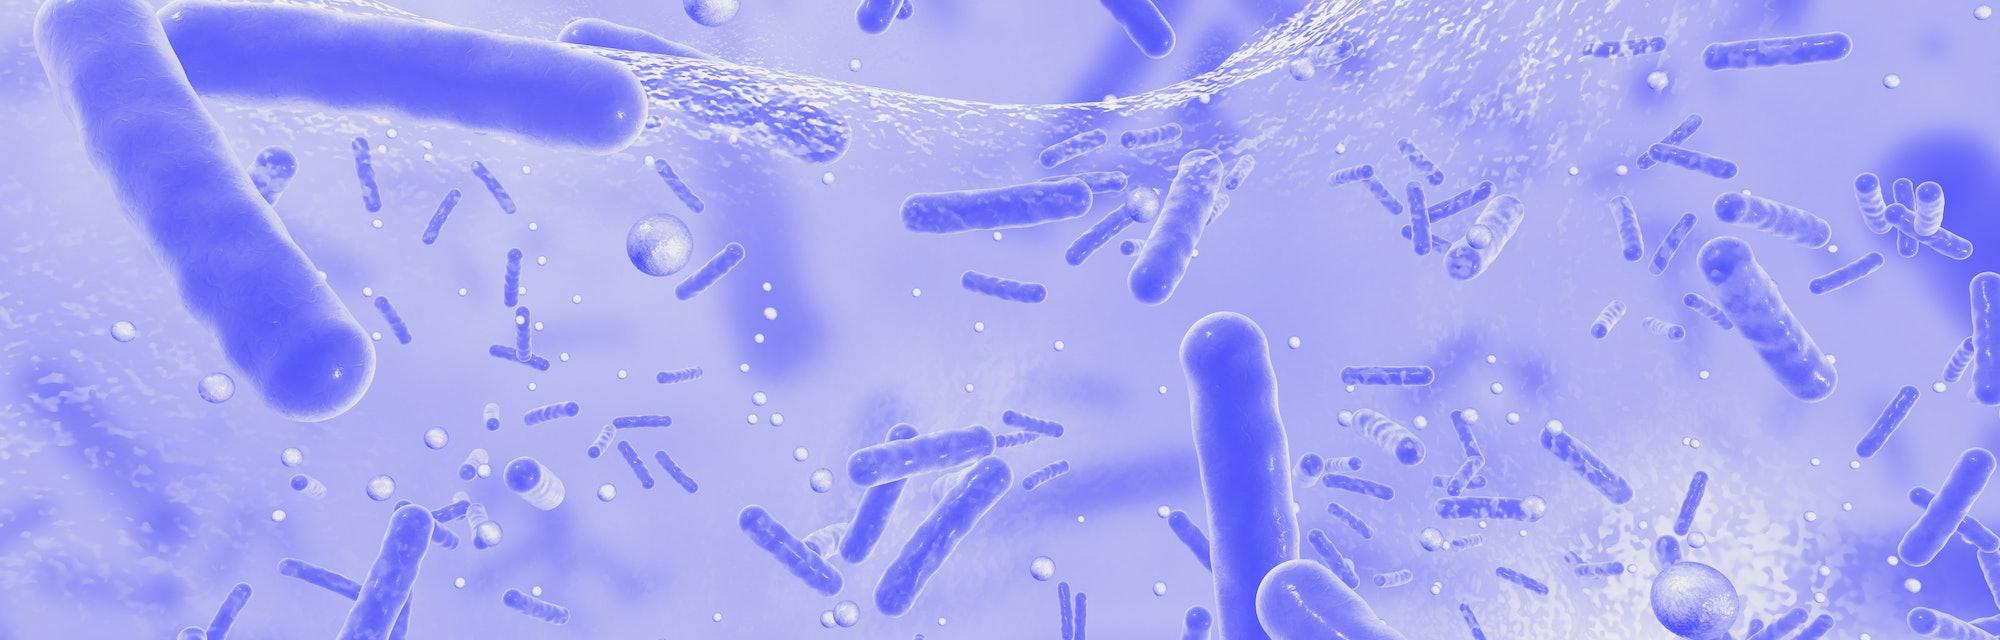 Antibiotic resistant bacteria inside a biofilm, 3D illustration. Biofilm is a community of bacteria ...